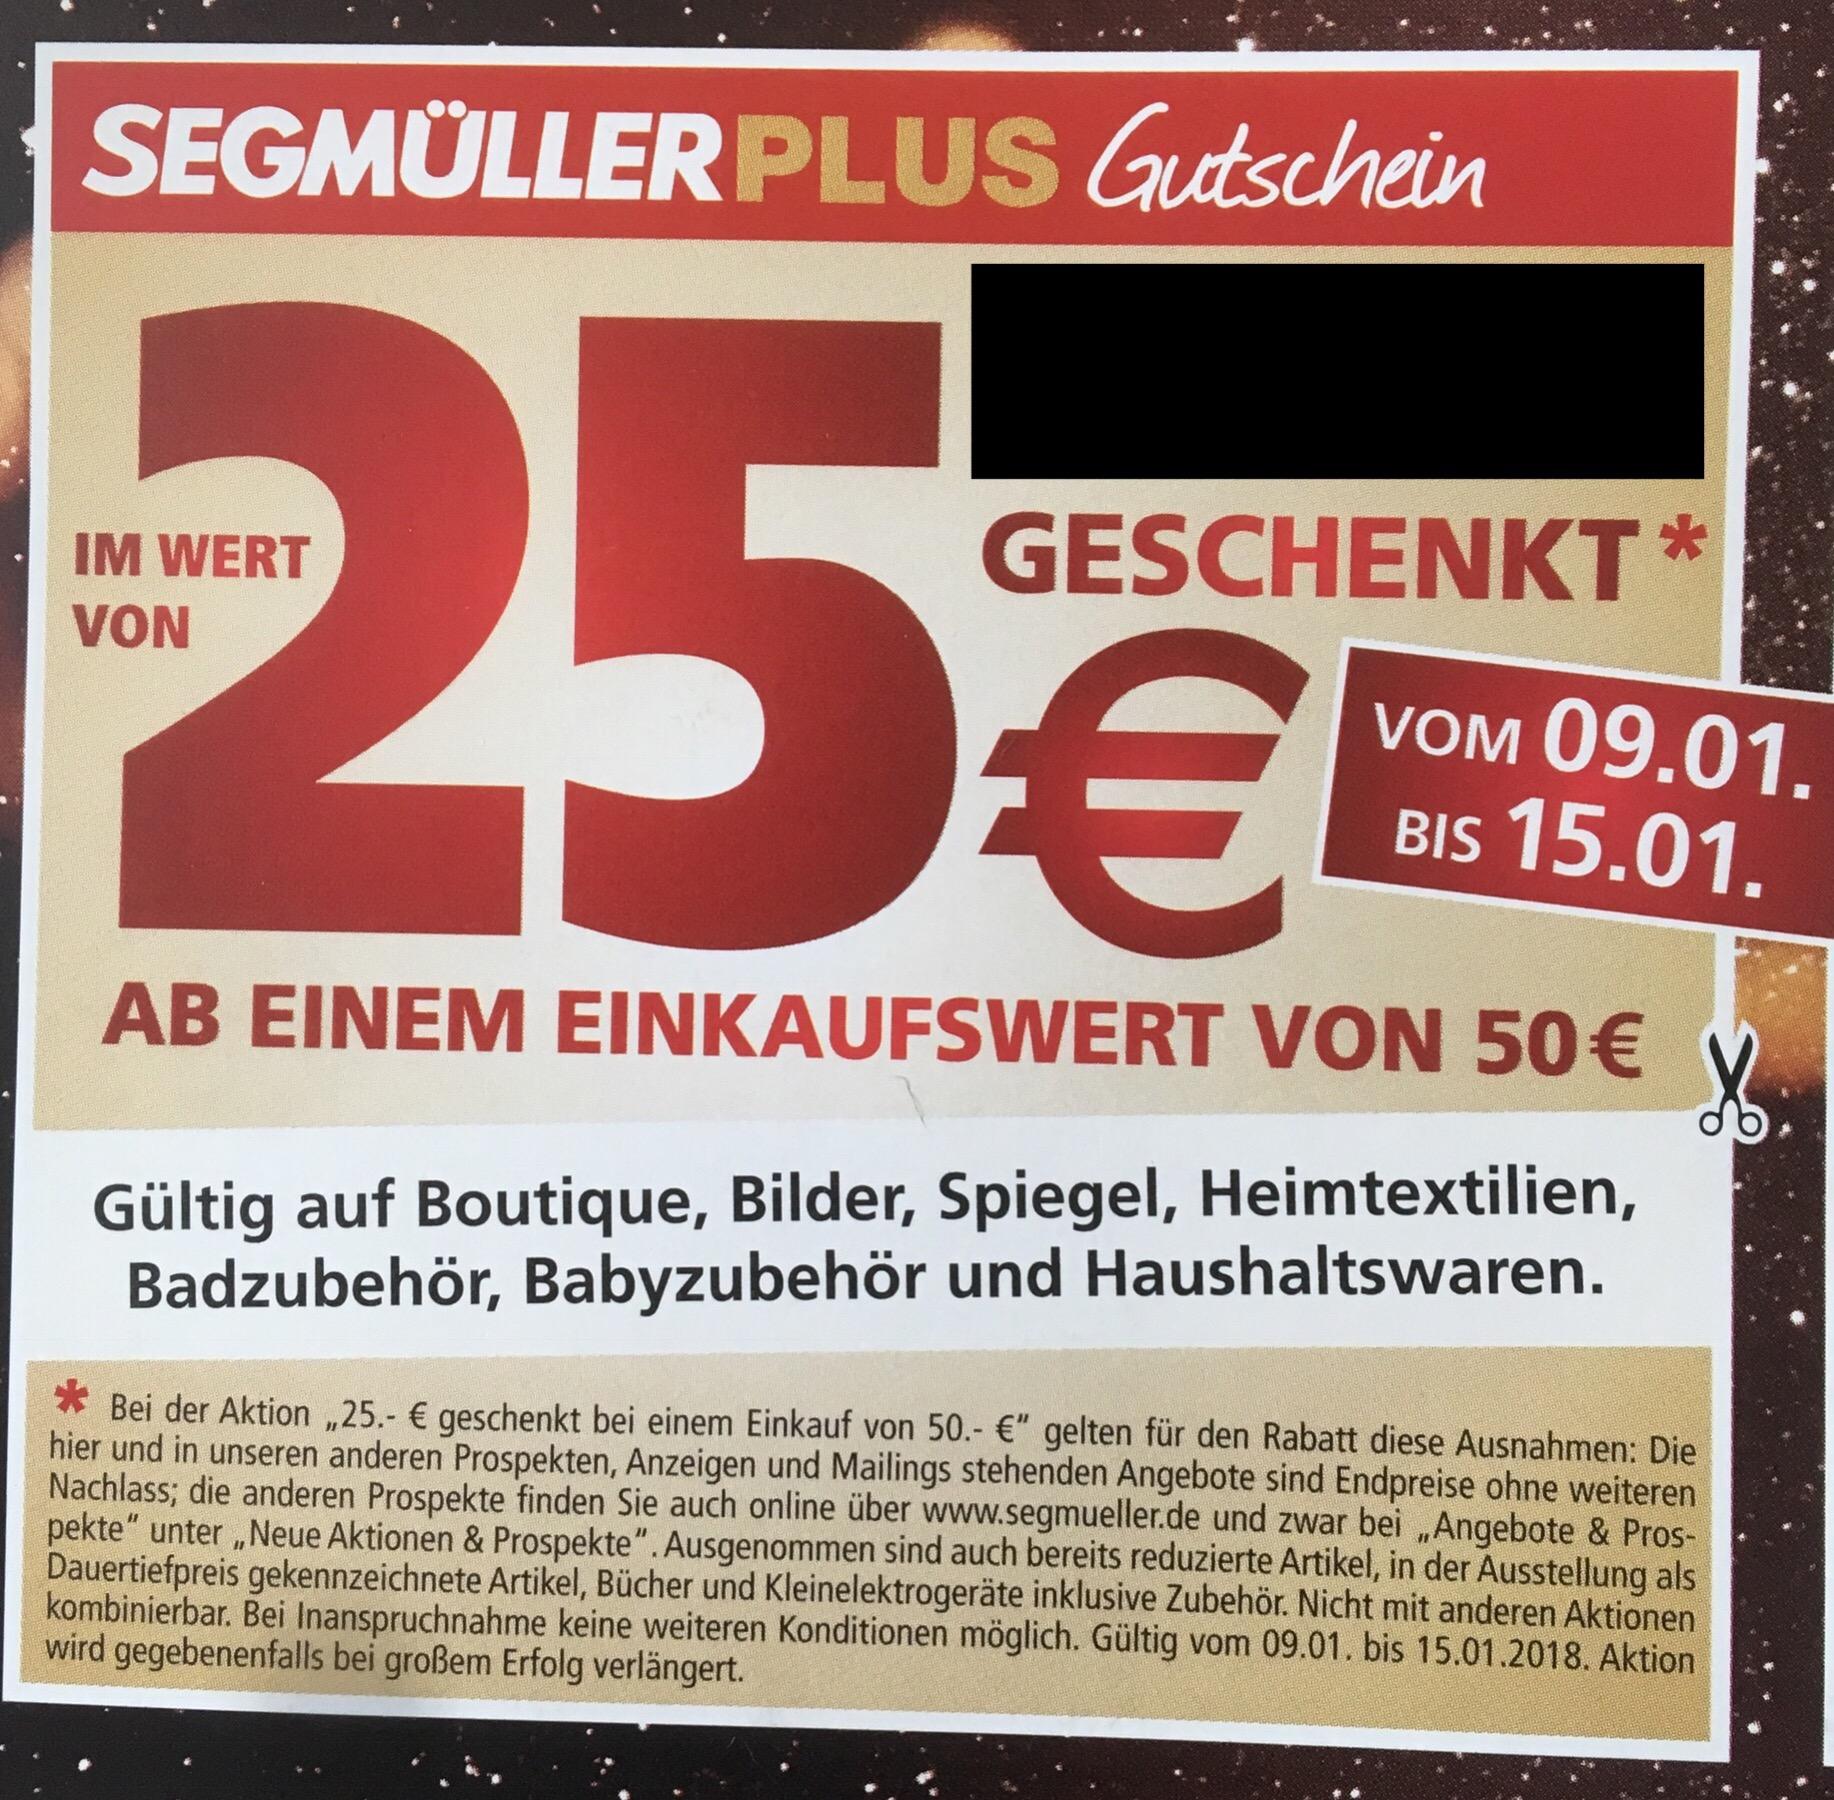 Segmüller Weiterstadt 25€ Nachlass ab 50€ Warenwert